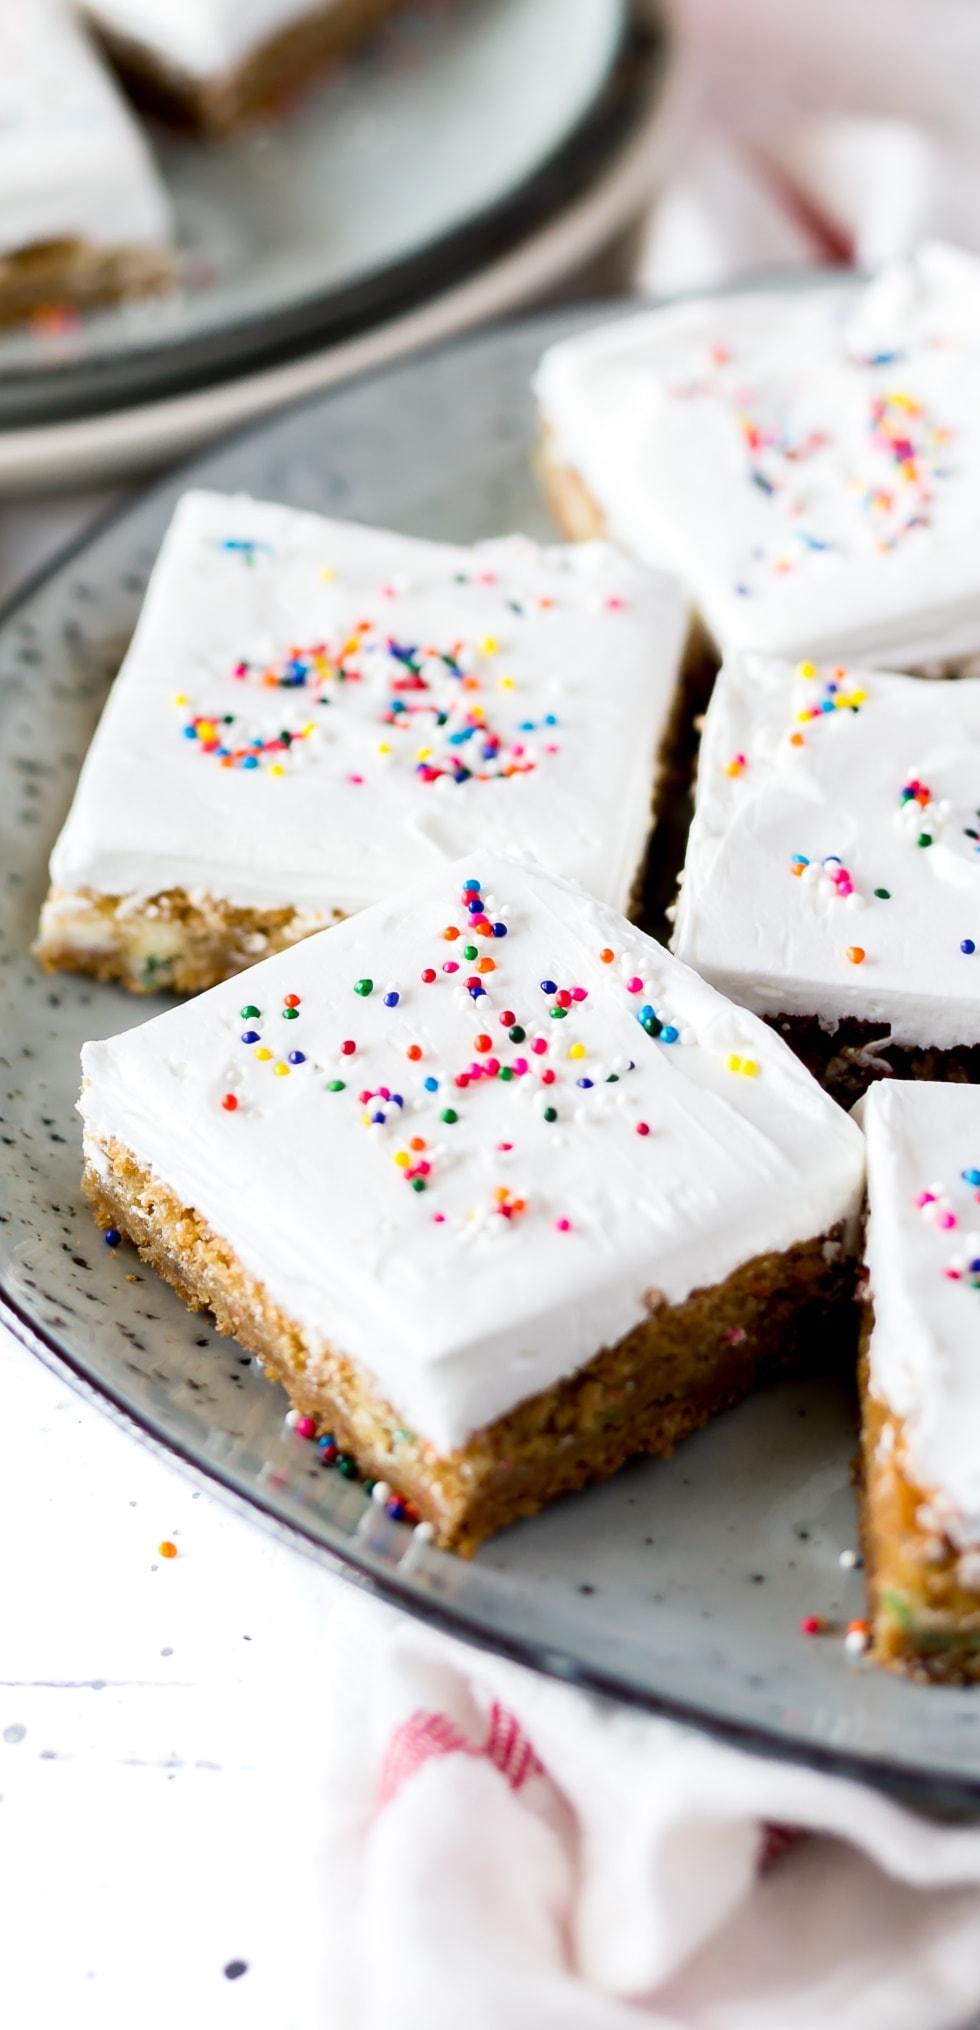 easy birthday cake recipe   Classic birthday cake recipe   homemade birthday cake ideas